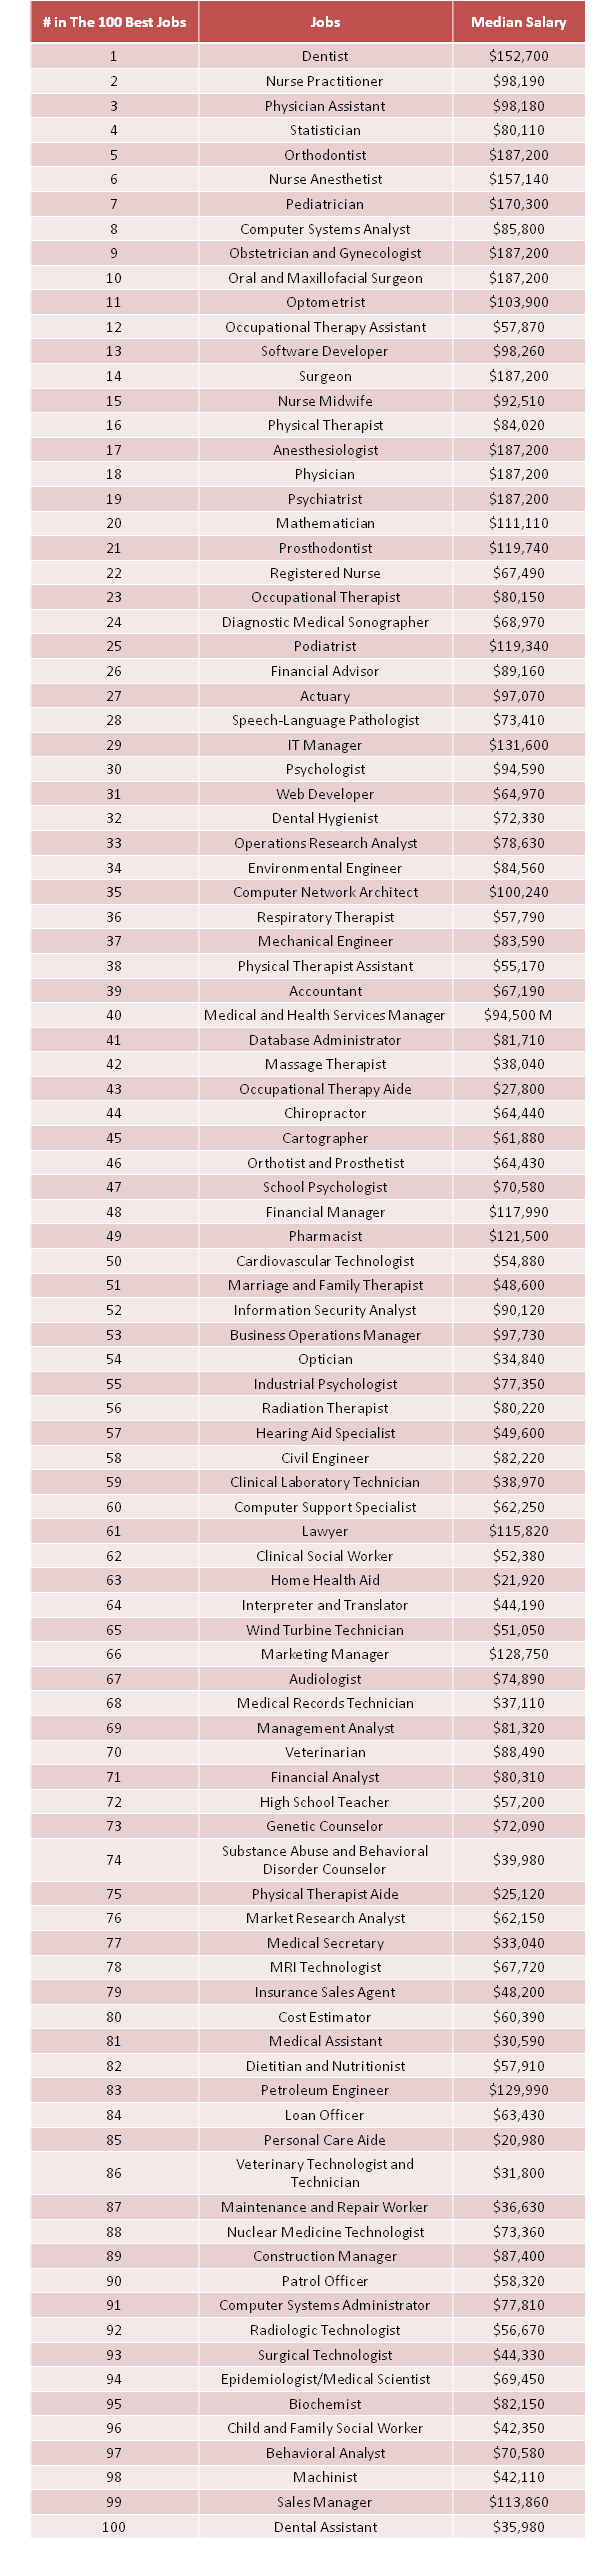 The 100 Best Jobs of 2017